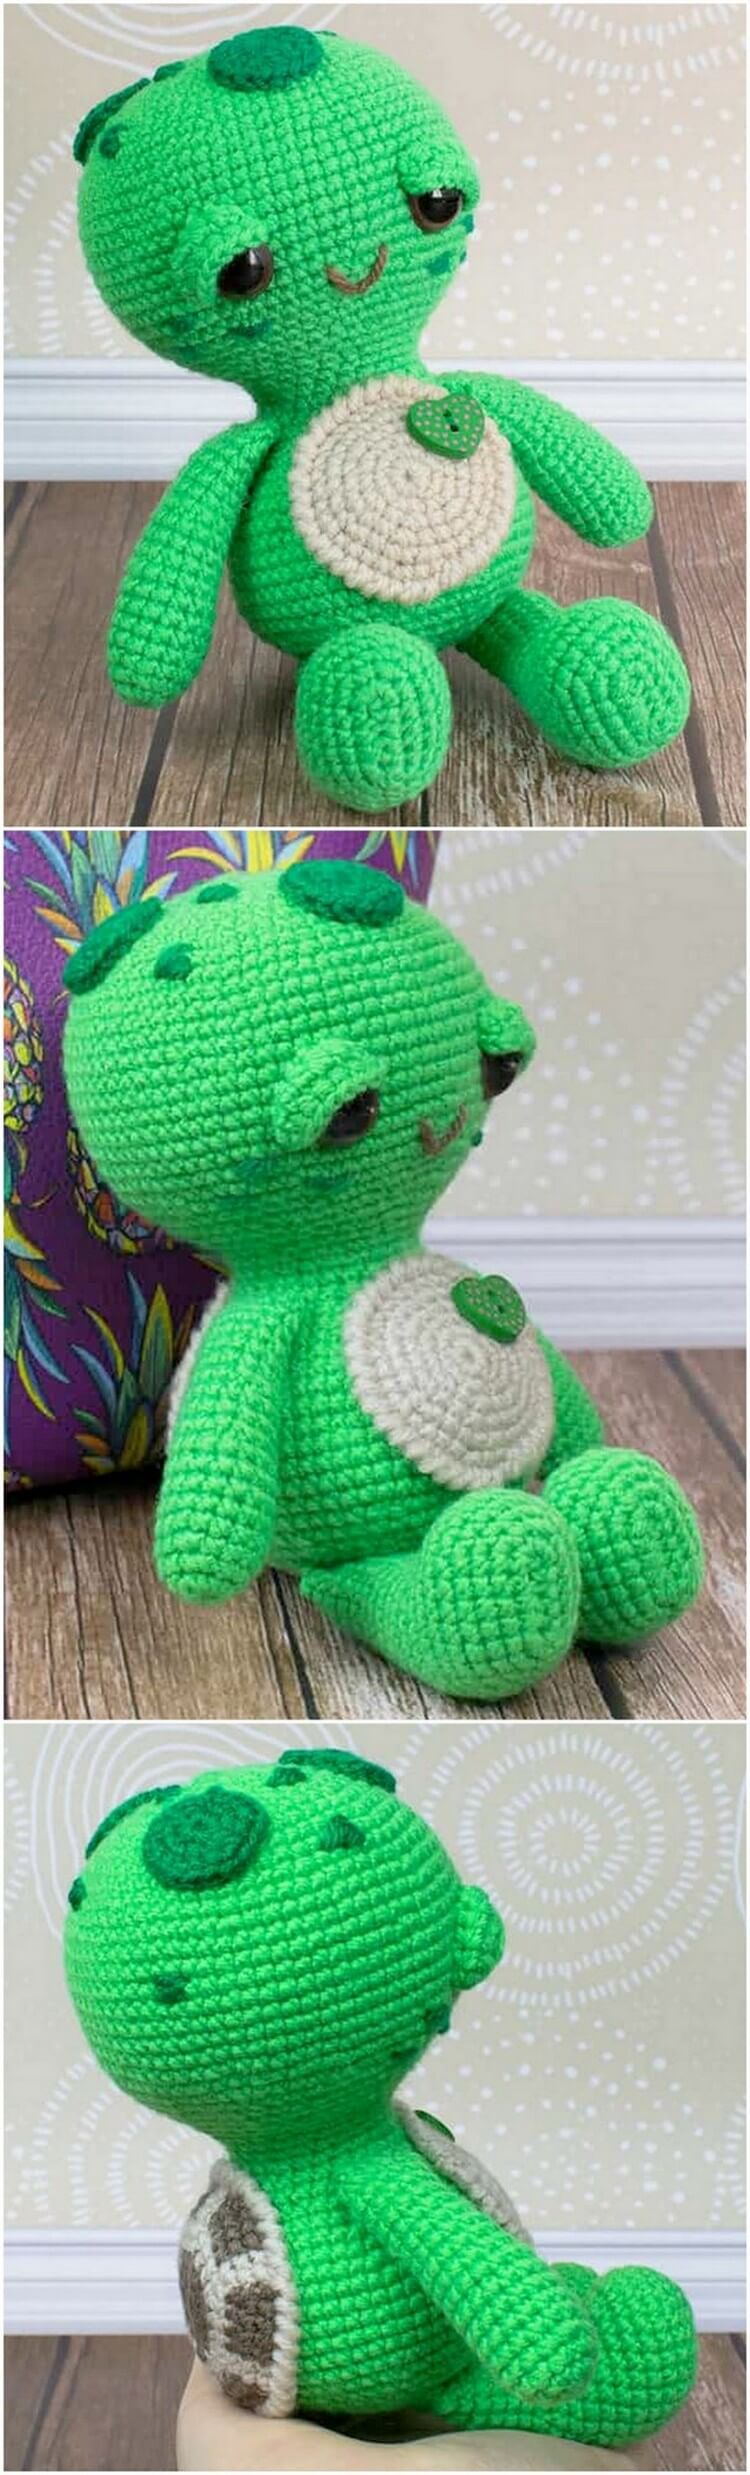 Crochet Amigurumi Pattern (70)